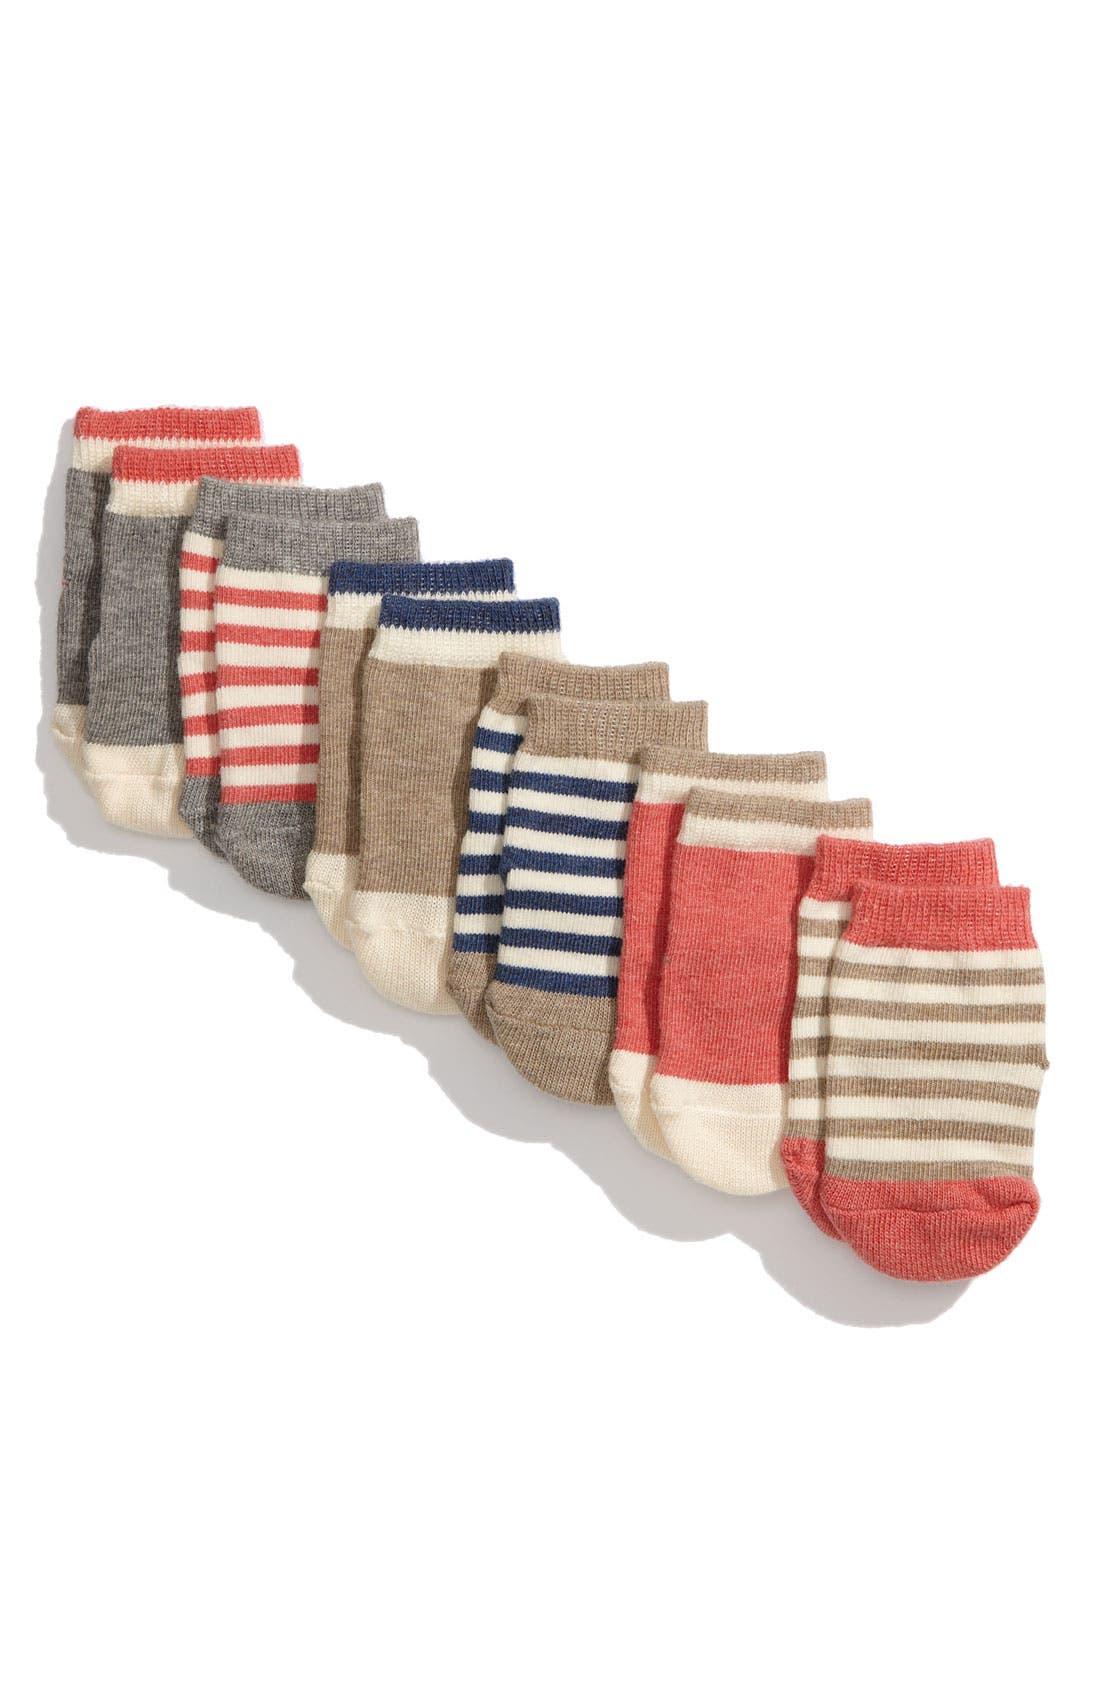 Alternate Image 2  - Etiquette Clothiers 'Vintage Bundle' Socks (6-Pack) (Infant)